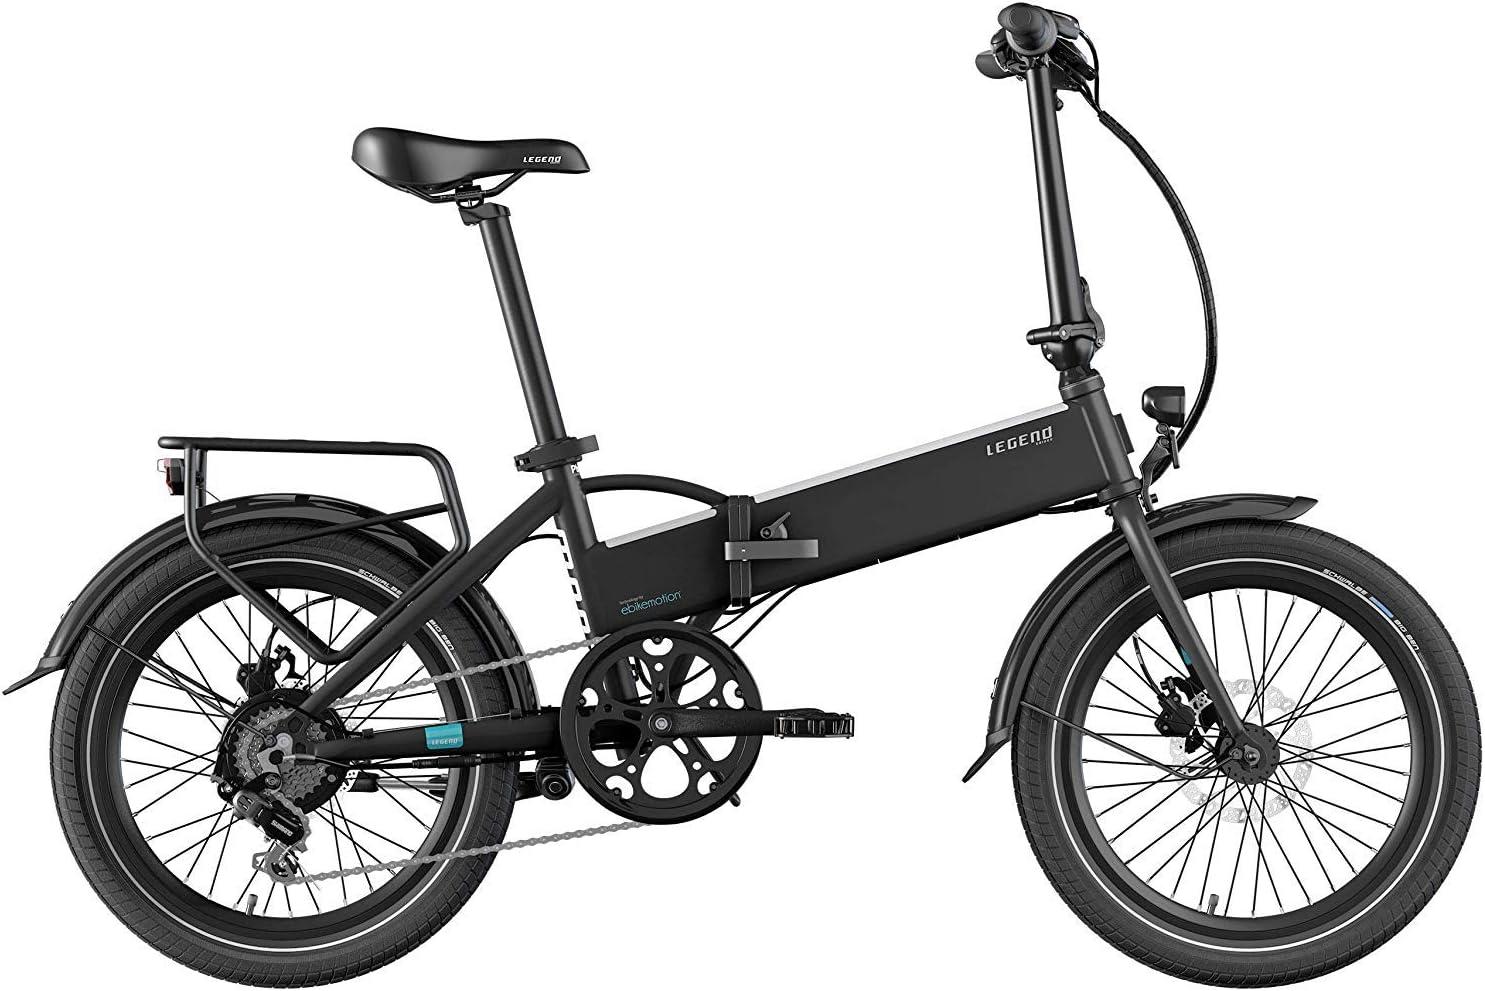 Legend eBikes Bicicleta Eléctrica Plegable Compacta con Rueda de 20 Pulgadas,